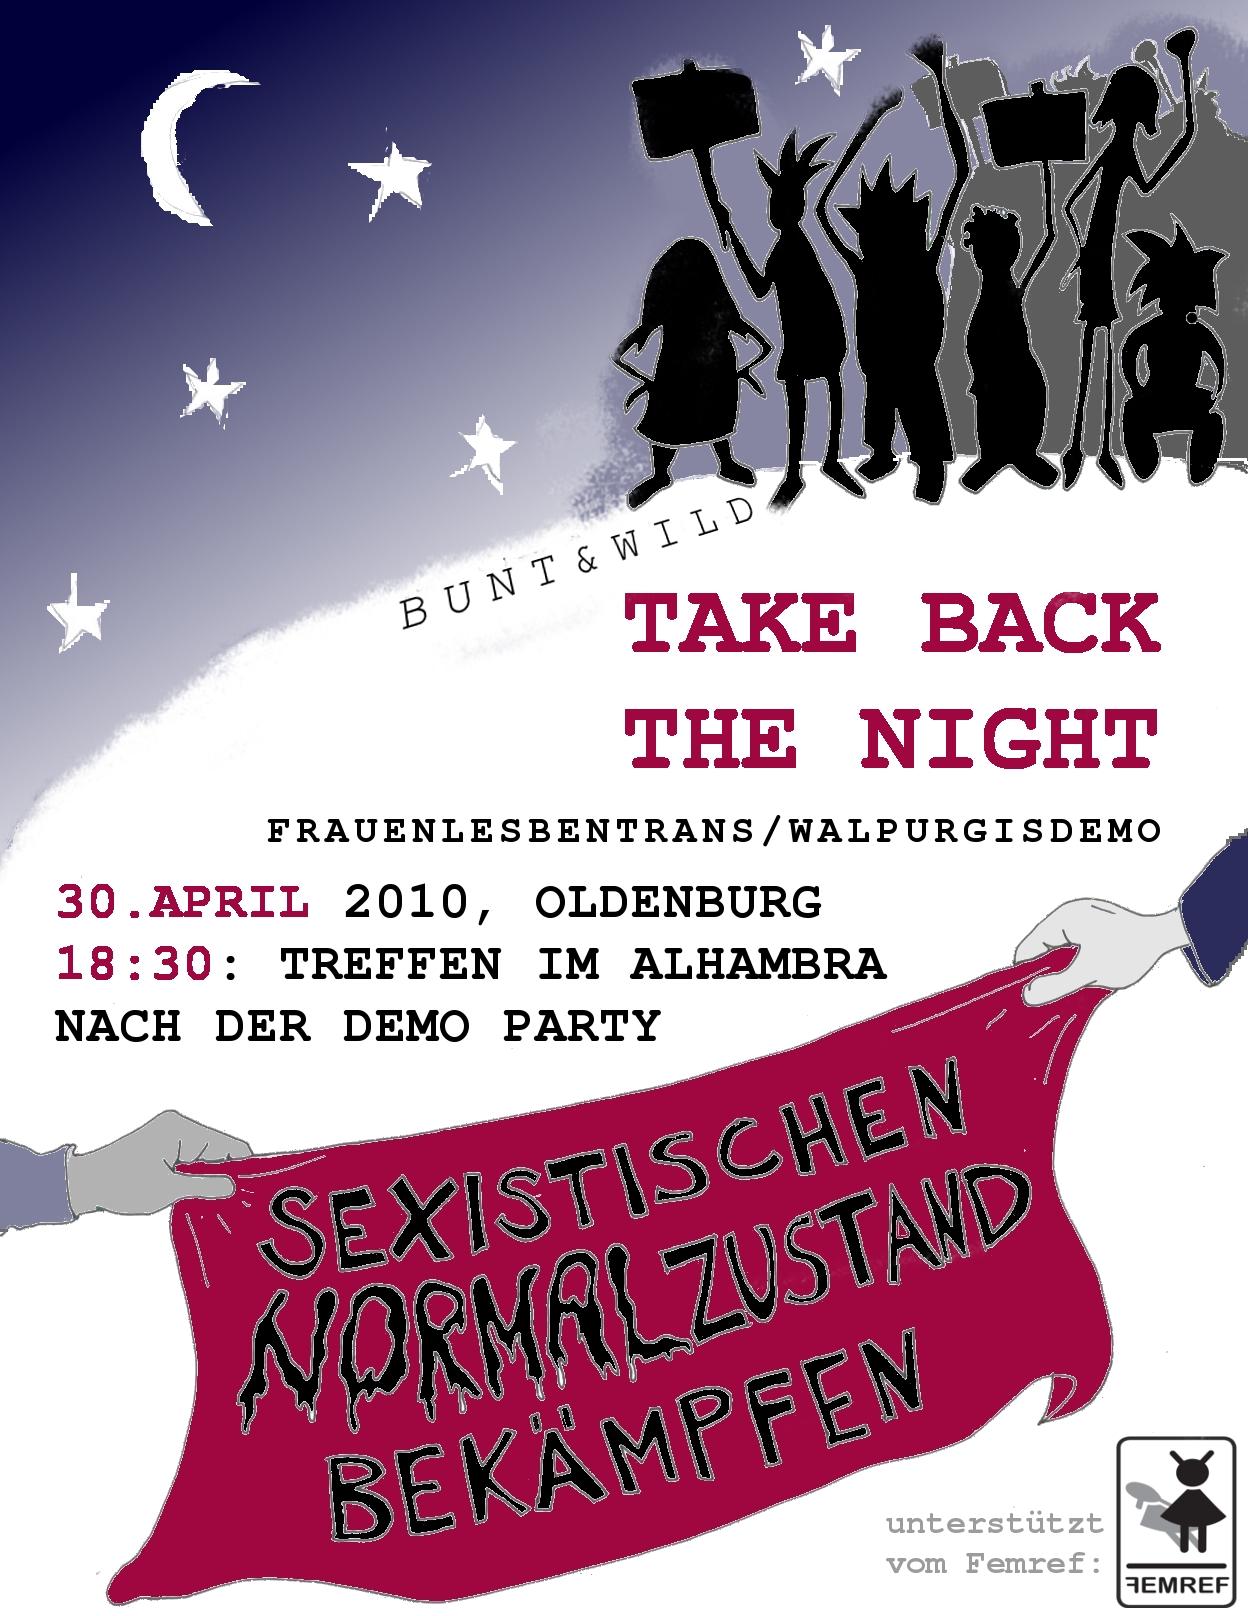 take back the night sexistischen normalzustand bek mpfen linkes vechta. Black Bedroom Furniture Sets. Home Design Ideas